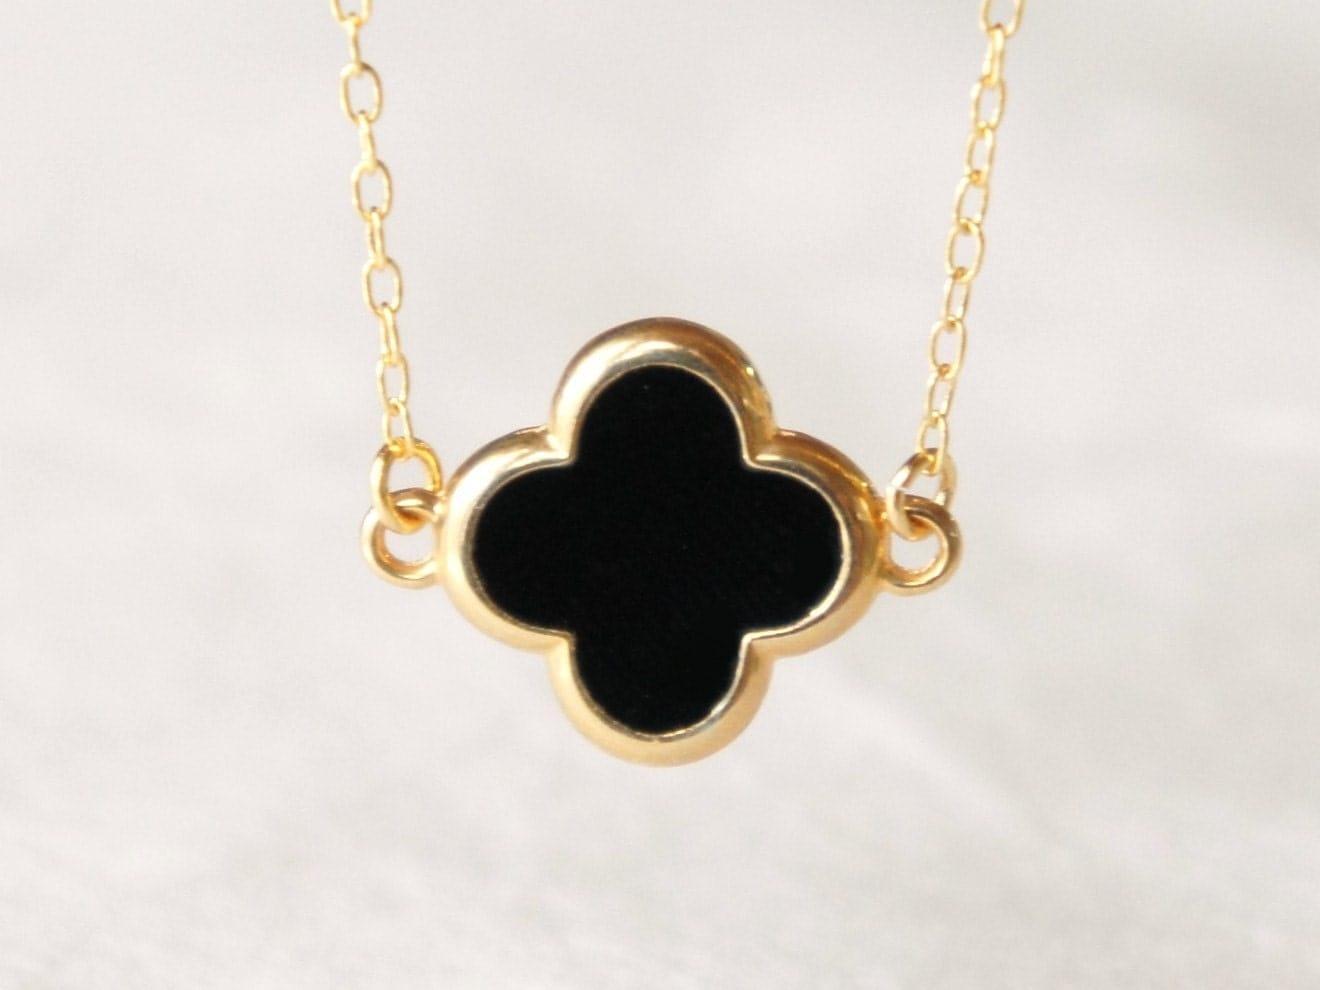 black four leaf clover necklace delicate 14k gold by